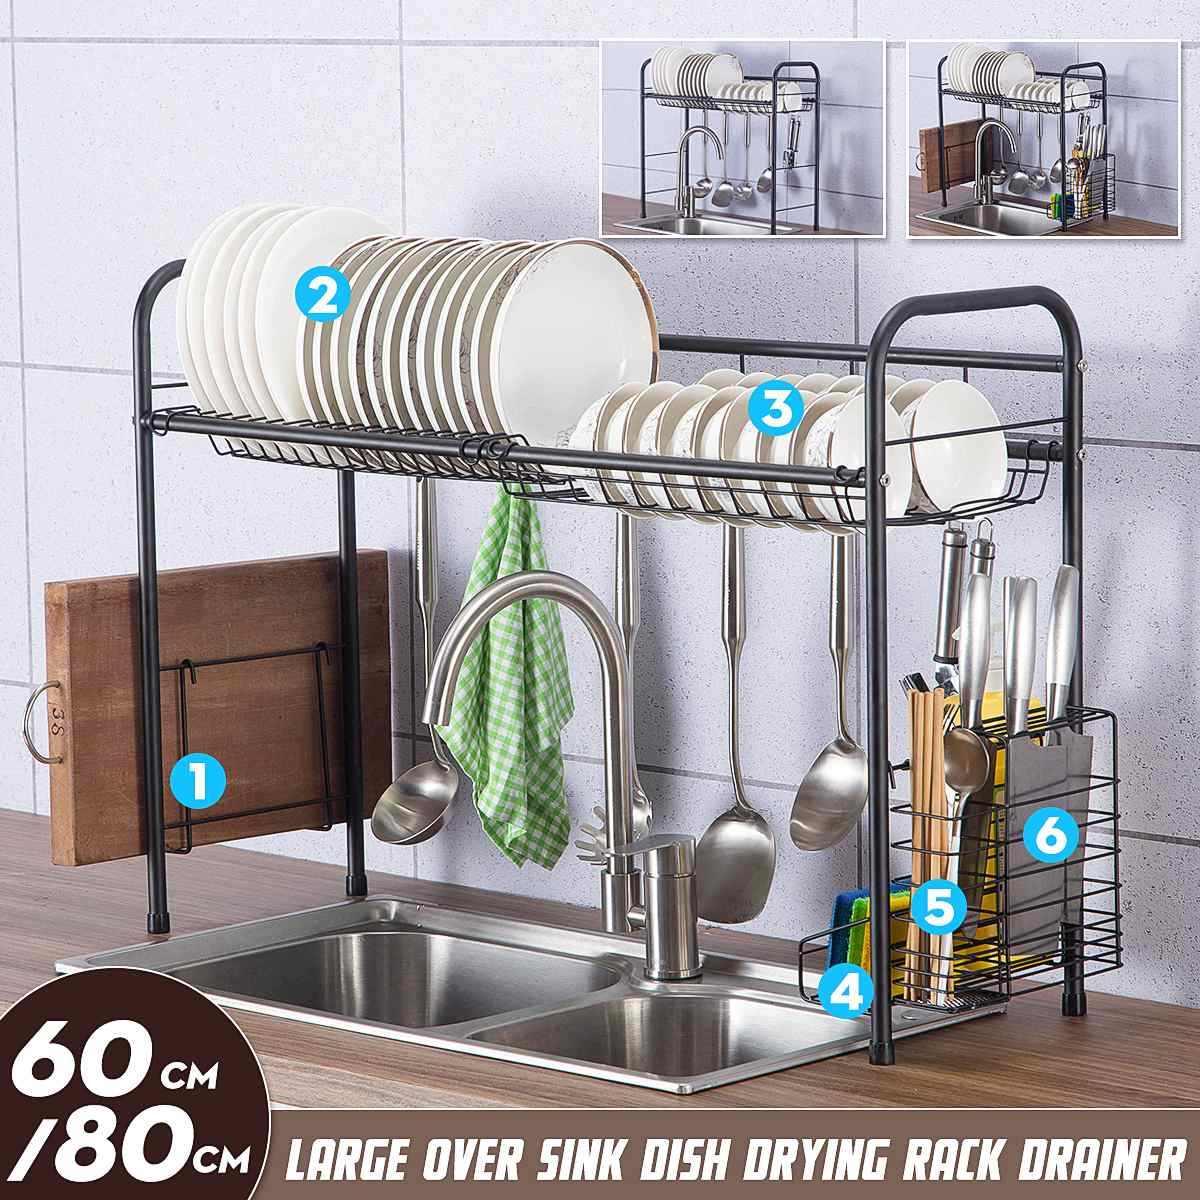 stainless steel over sink dish rack drainer kitchen organizer storage holder shelf drying plate basket knife fork organizer tool